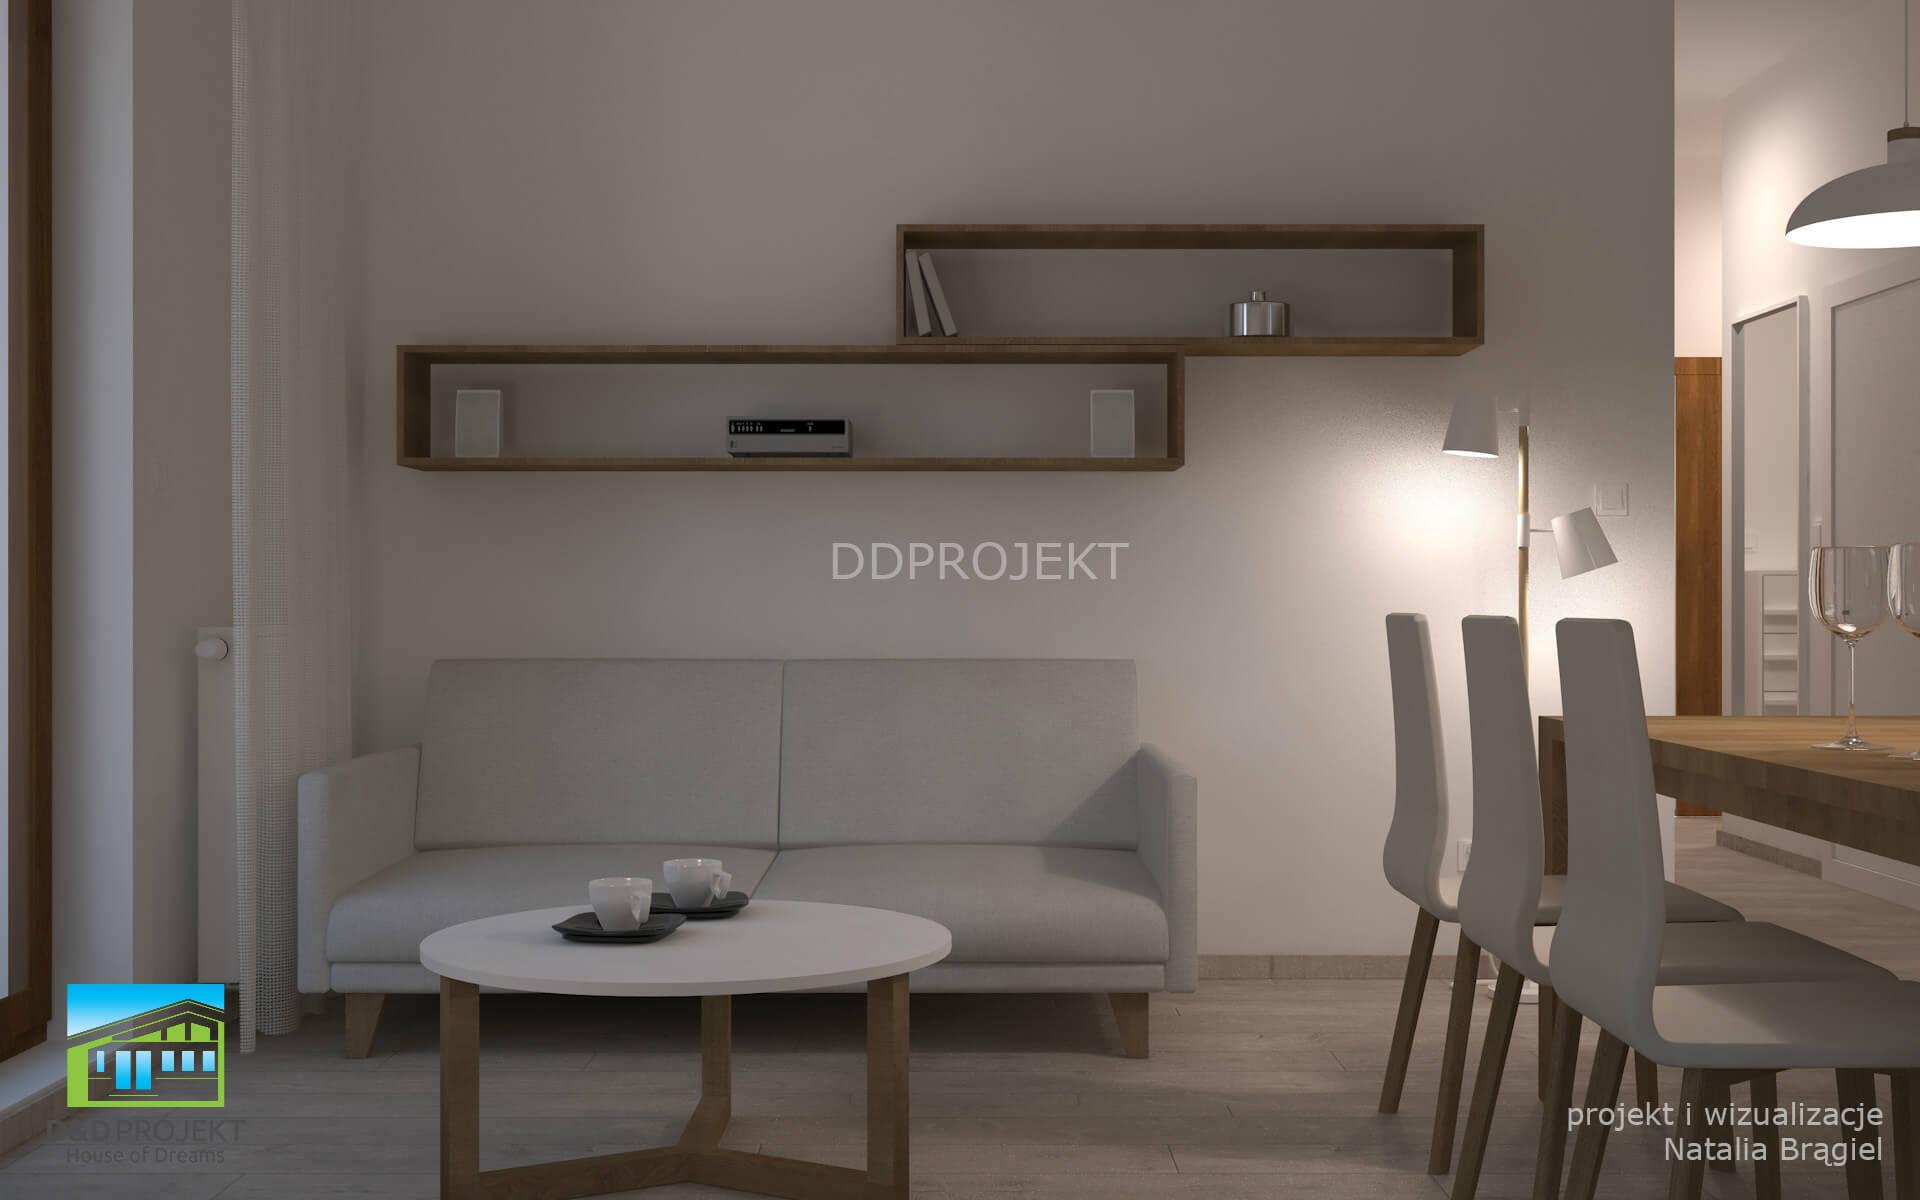 https://ddprojekt.pl/wp-content/uploads/2020/03/salon-z-kuchniawidok4.jpg